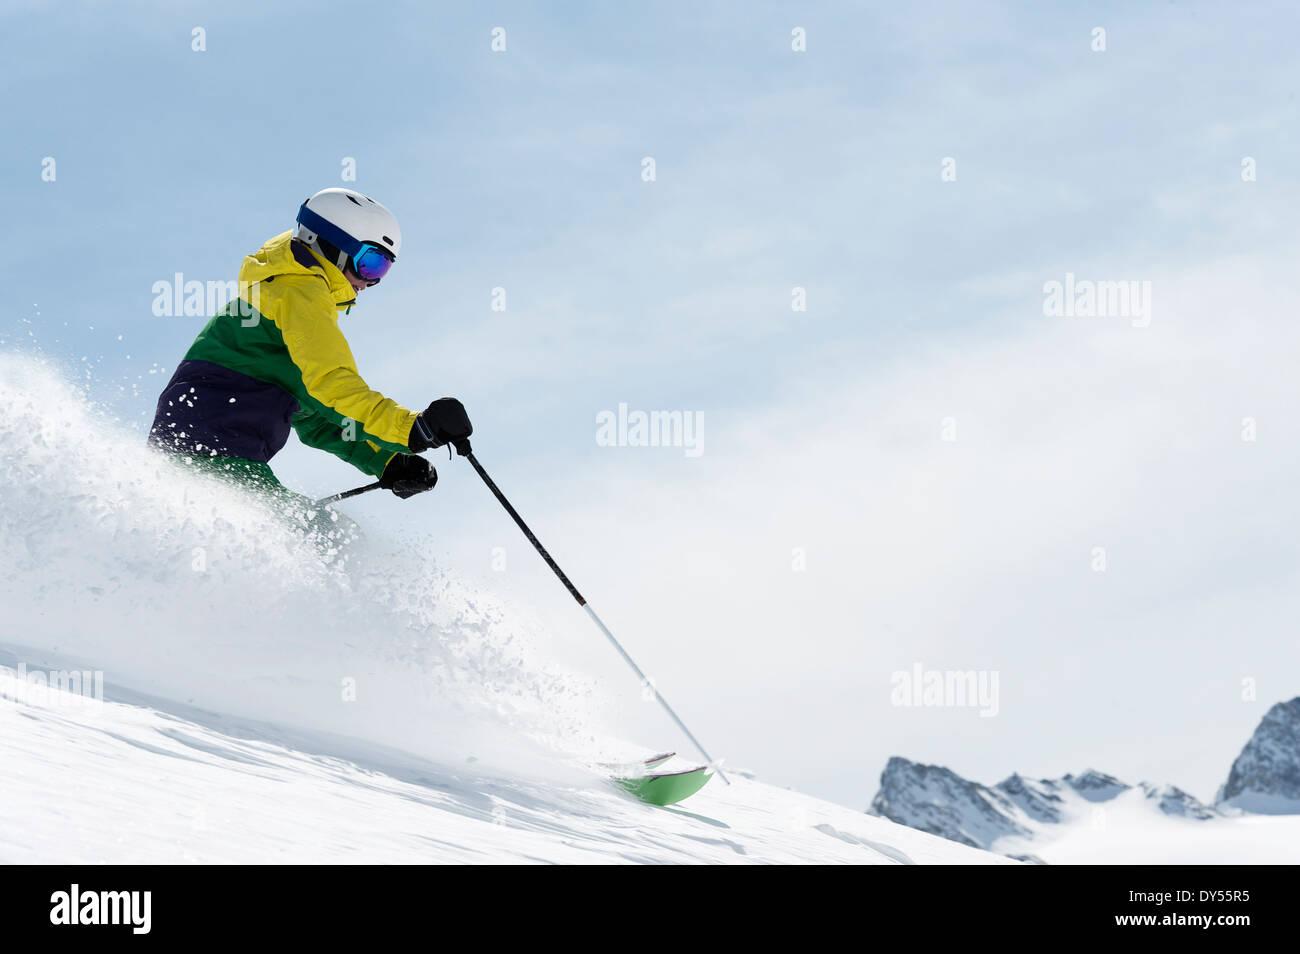 Young woman skiing downhill, Obergurgl, Austria - Stock Image